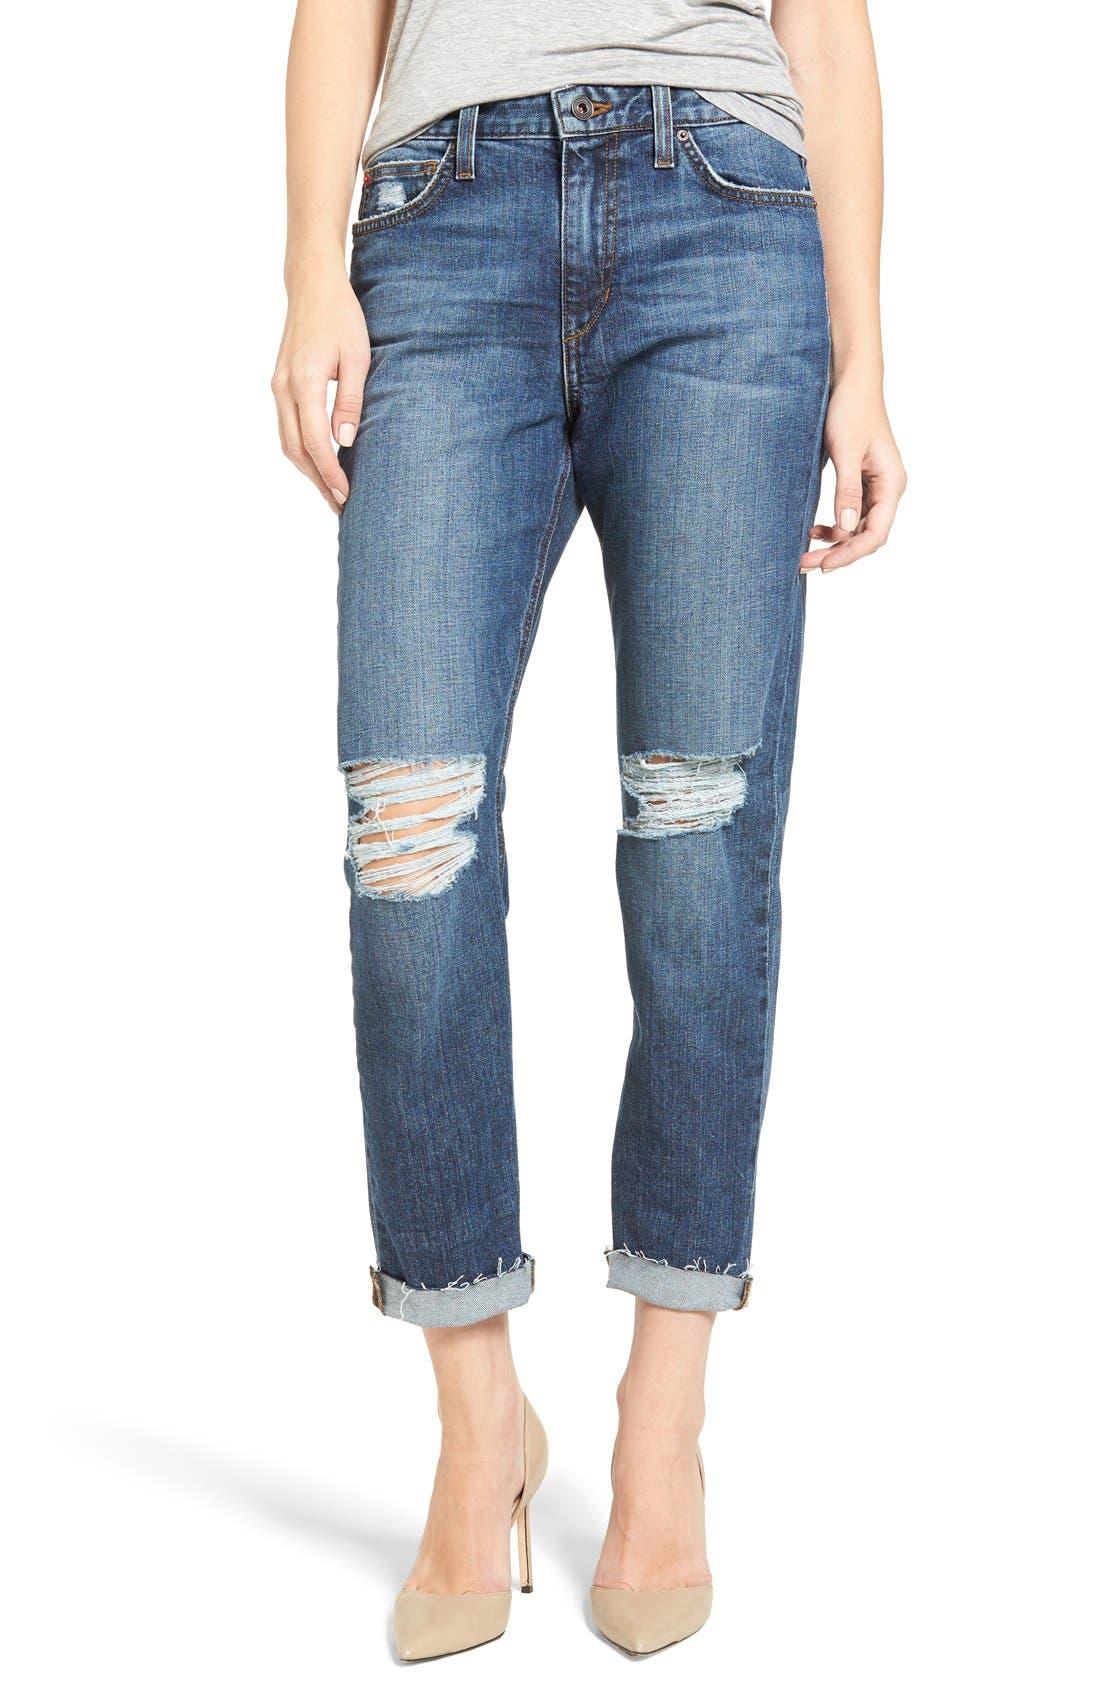 Main Image - Joes Jeans Debbie High Waist Ripped Boyfriend Jeans (Coppola)